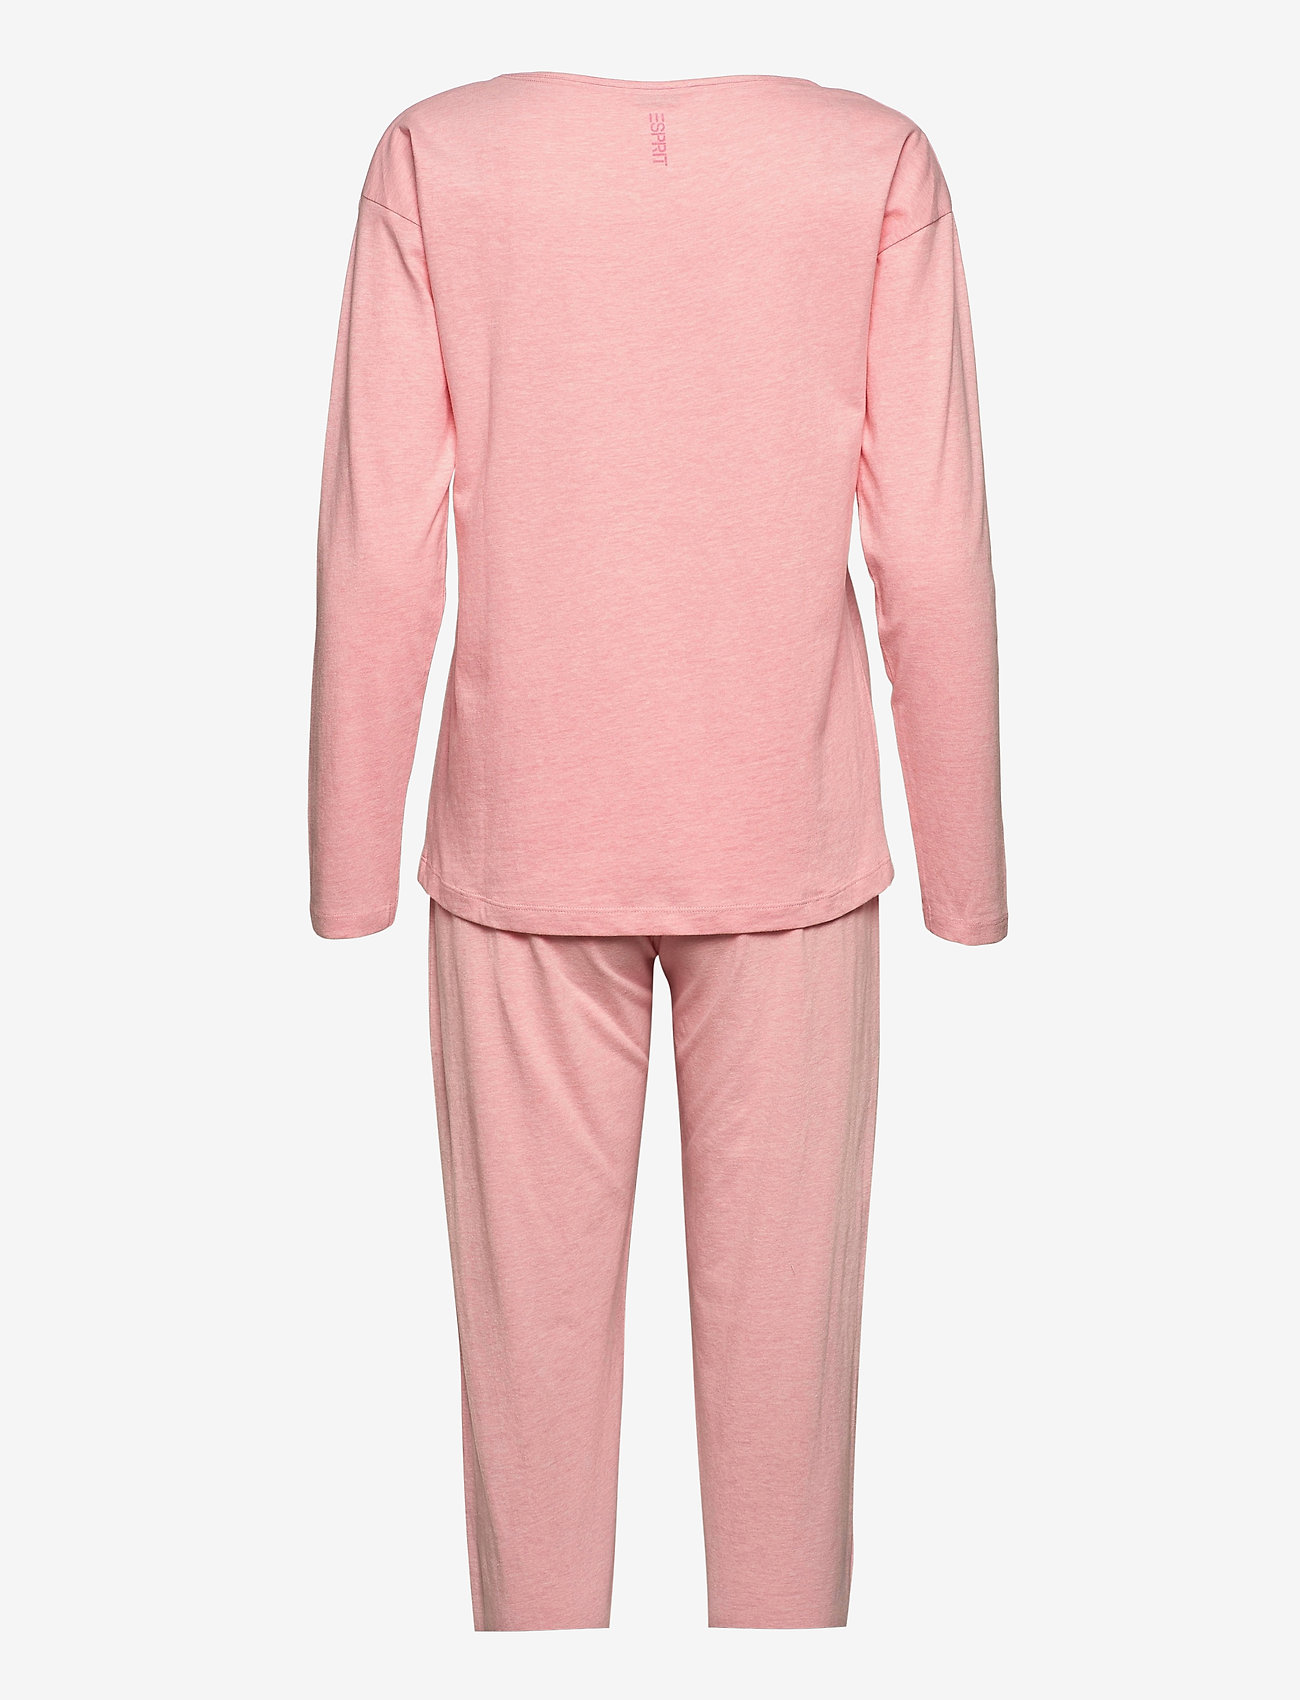 Esprit Bodywear Women - Pyjamas - pyjama''s - coral - 1